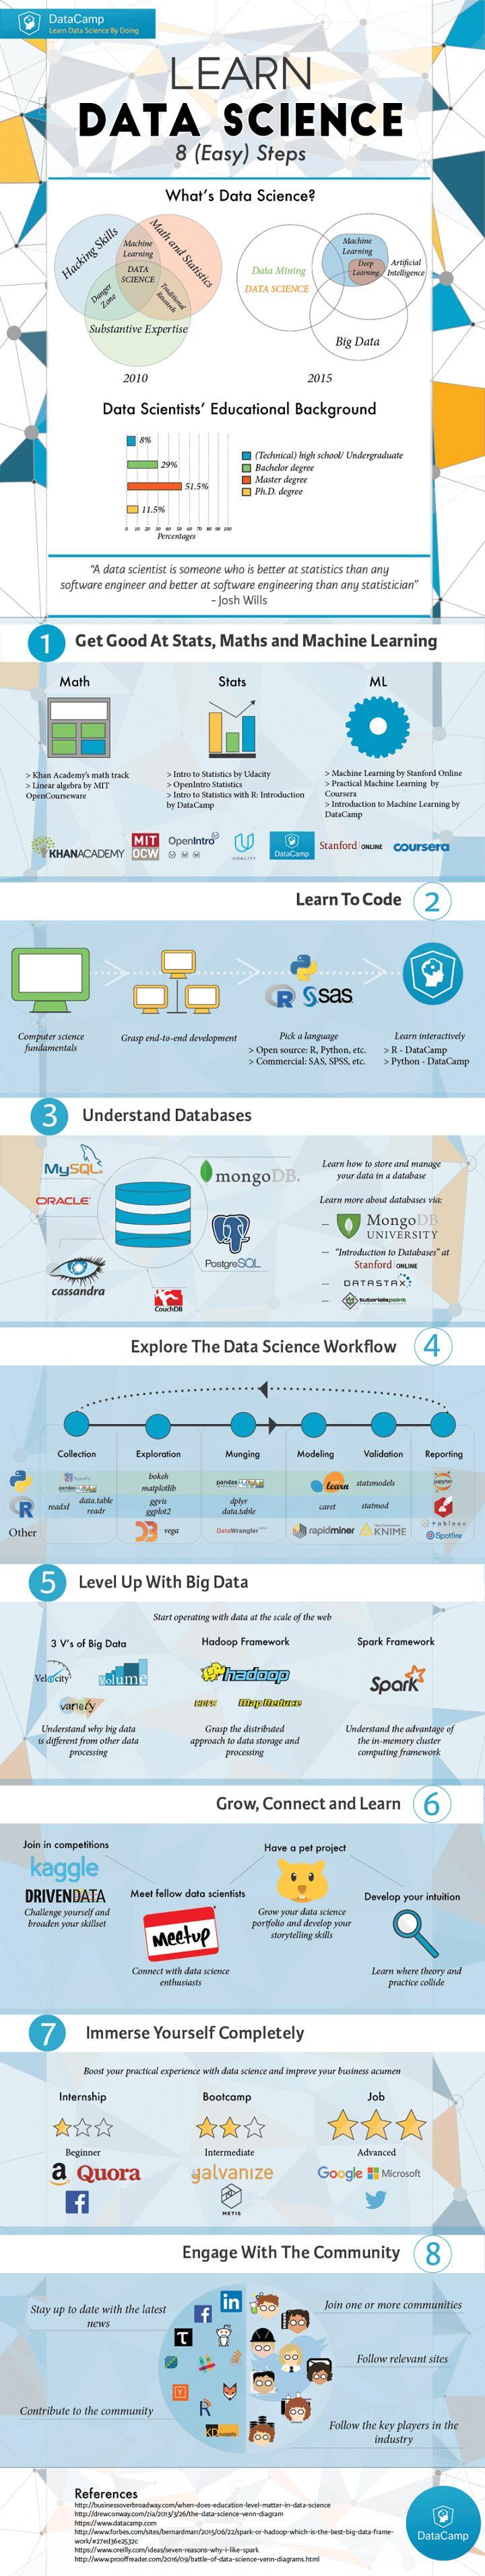 Learn Data Science: Eight (Easy) Steps - insideBIGDATA